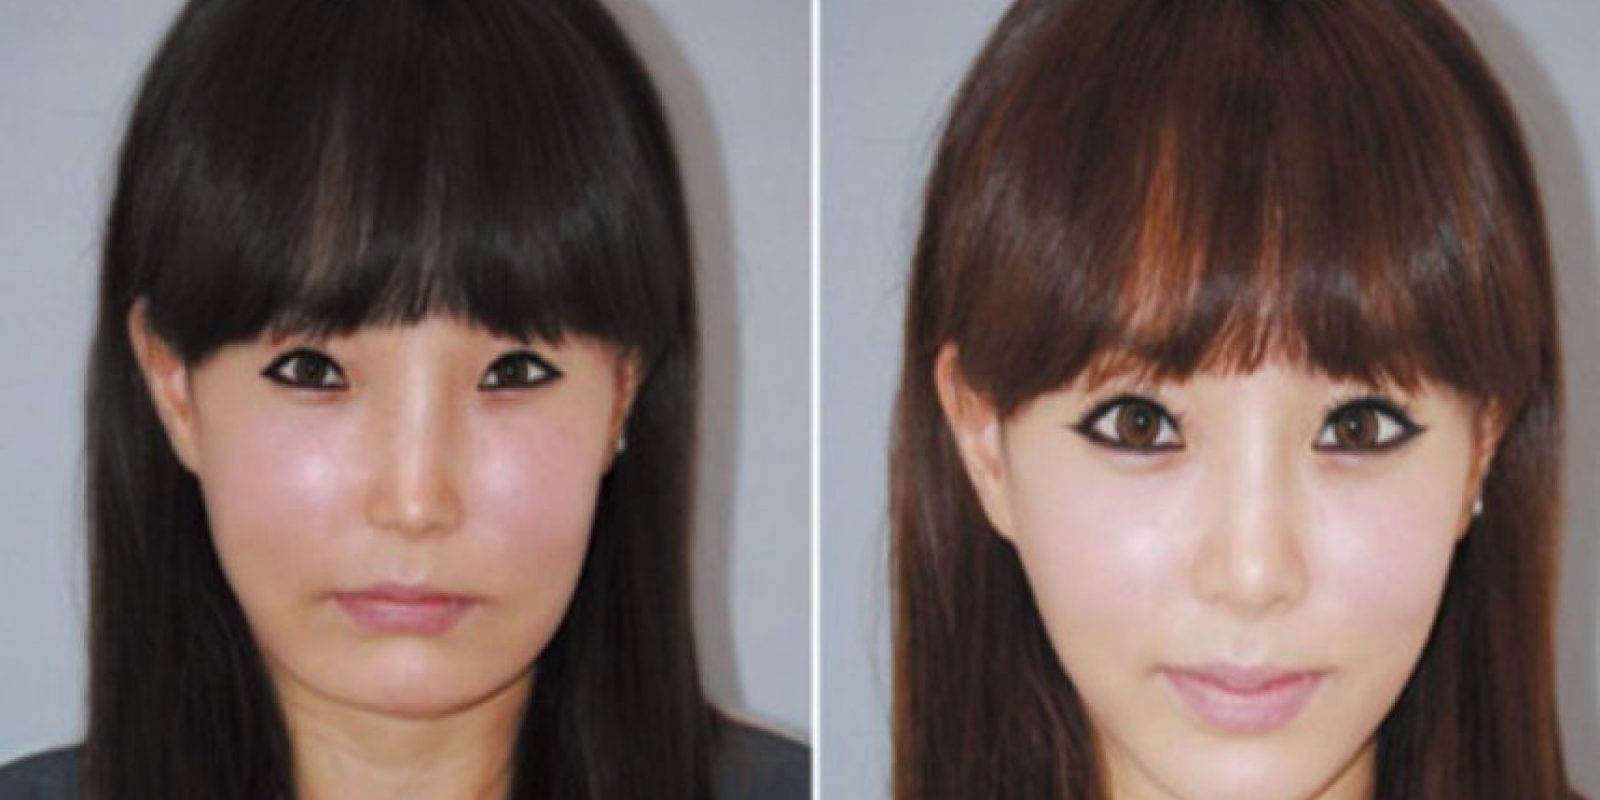 Por eso sus rasgos son tan finos. Foto: vía Korean Plastic Surgery /Tumblr